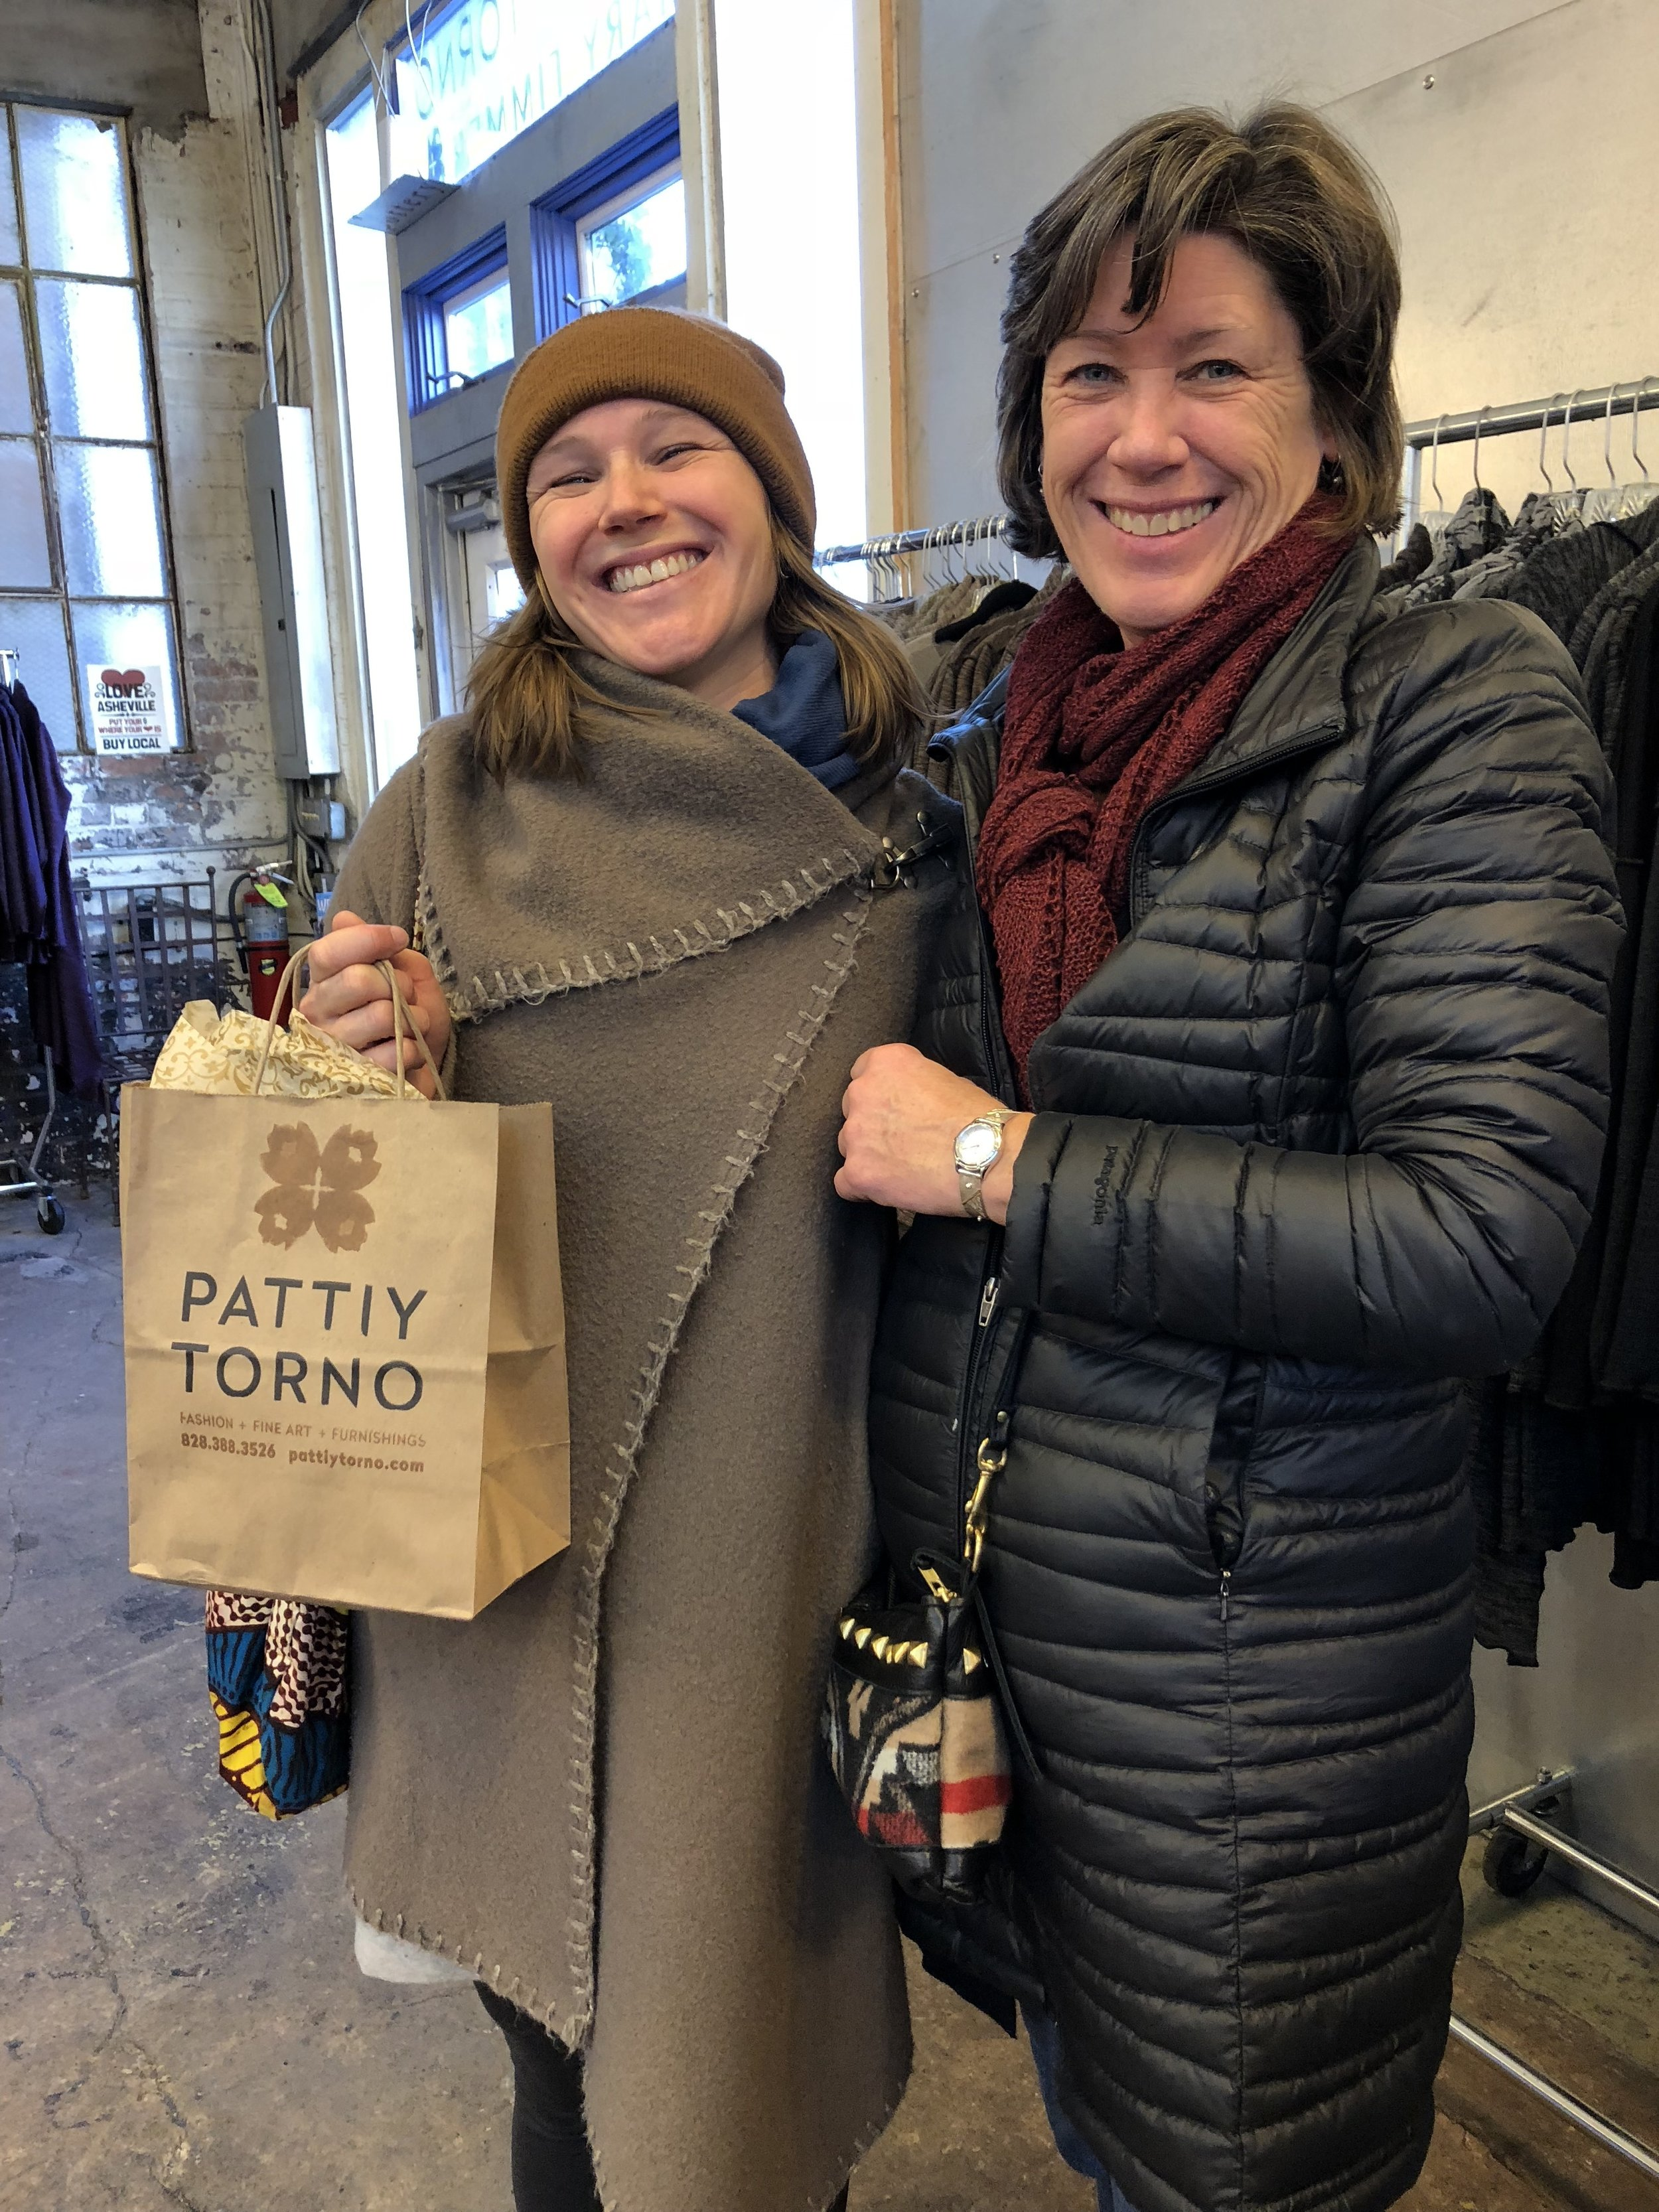 Pattiy Torno Asheville